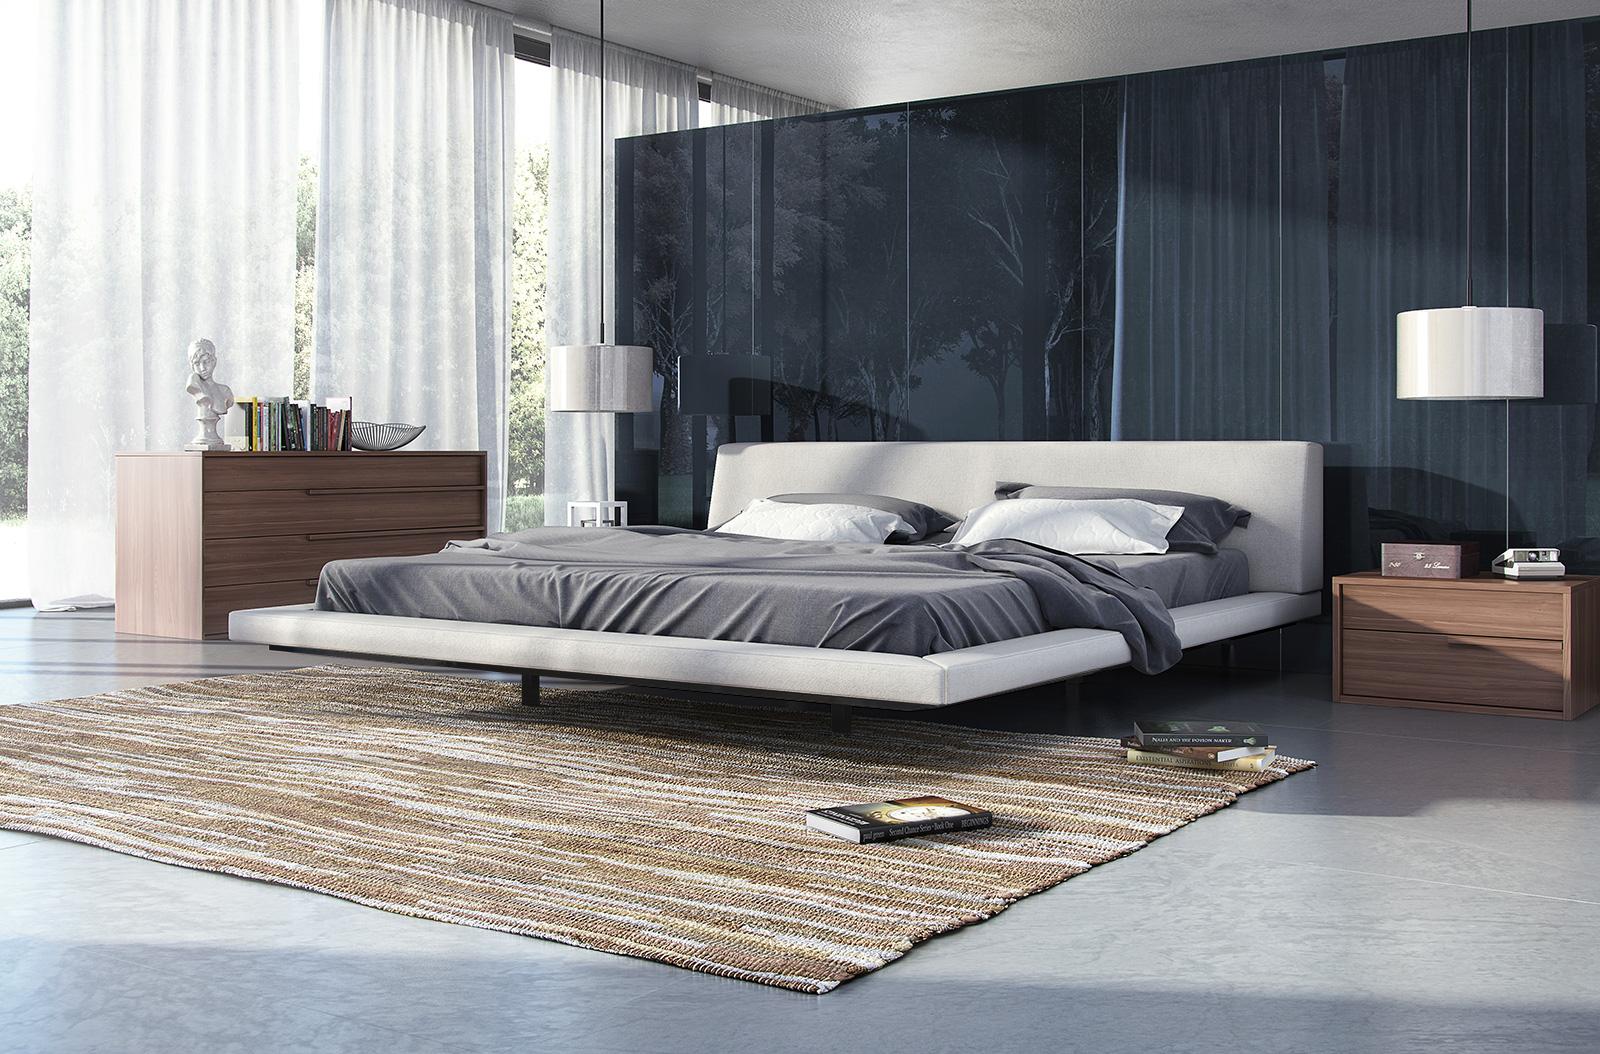 Fashionable Wood High End Platform Bed Fresno California Mljan